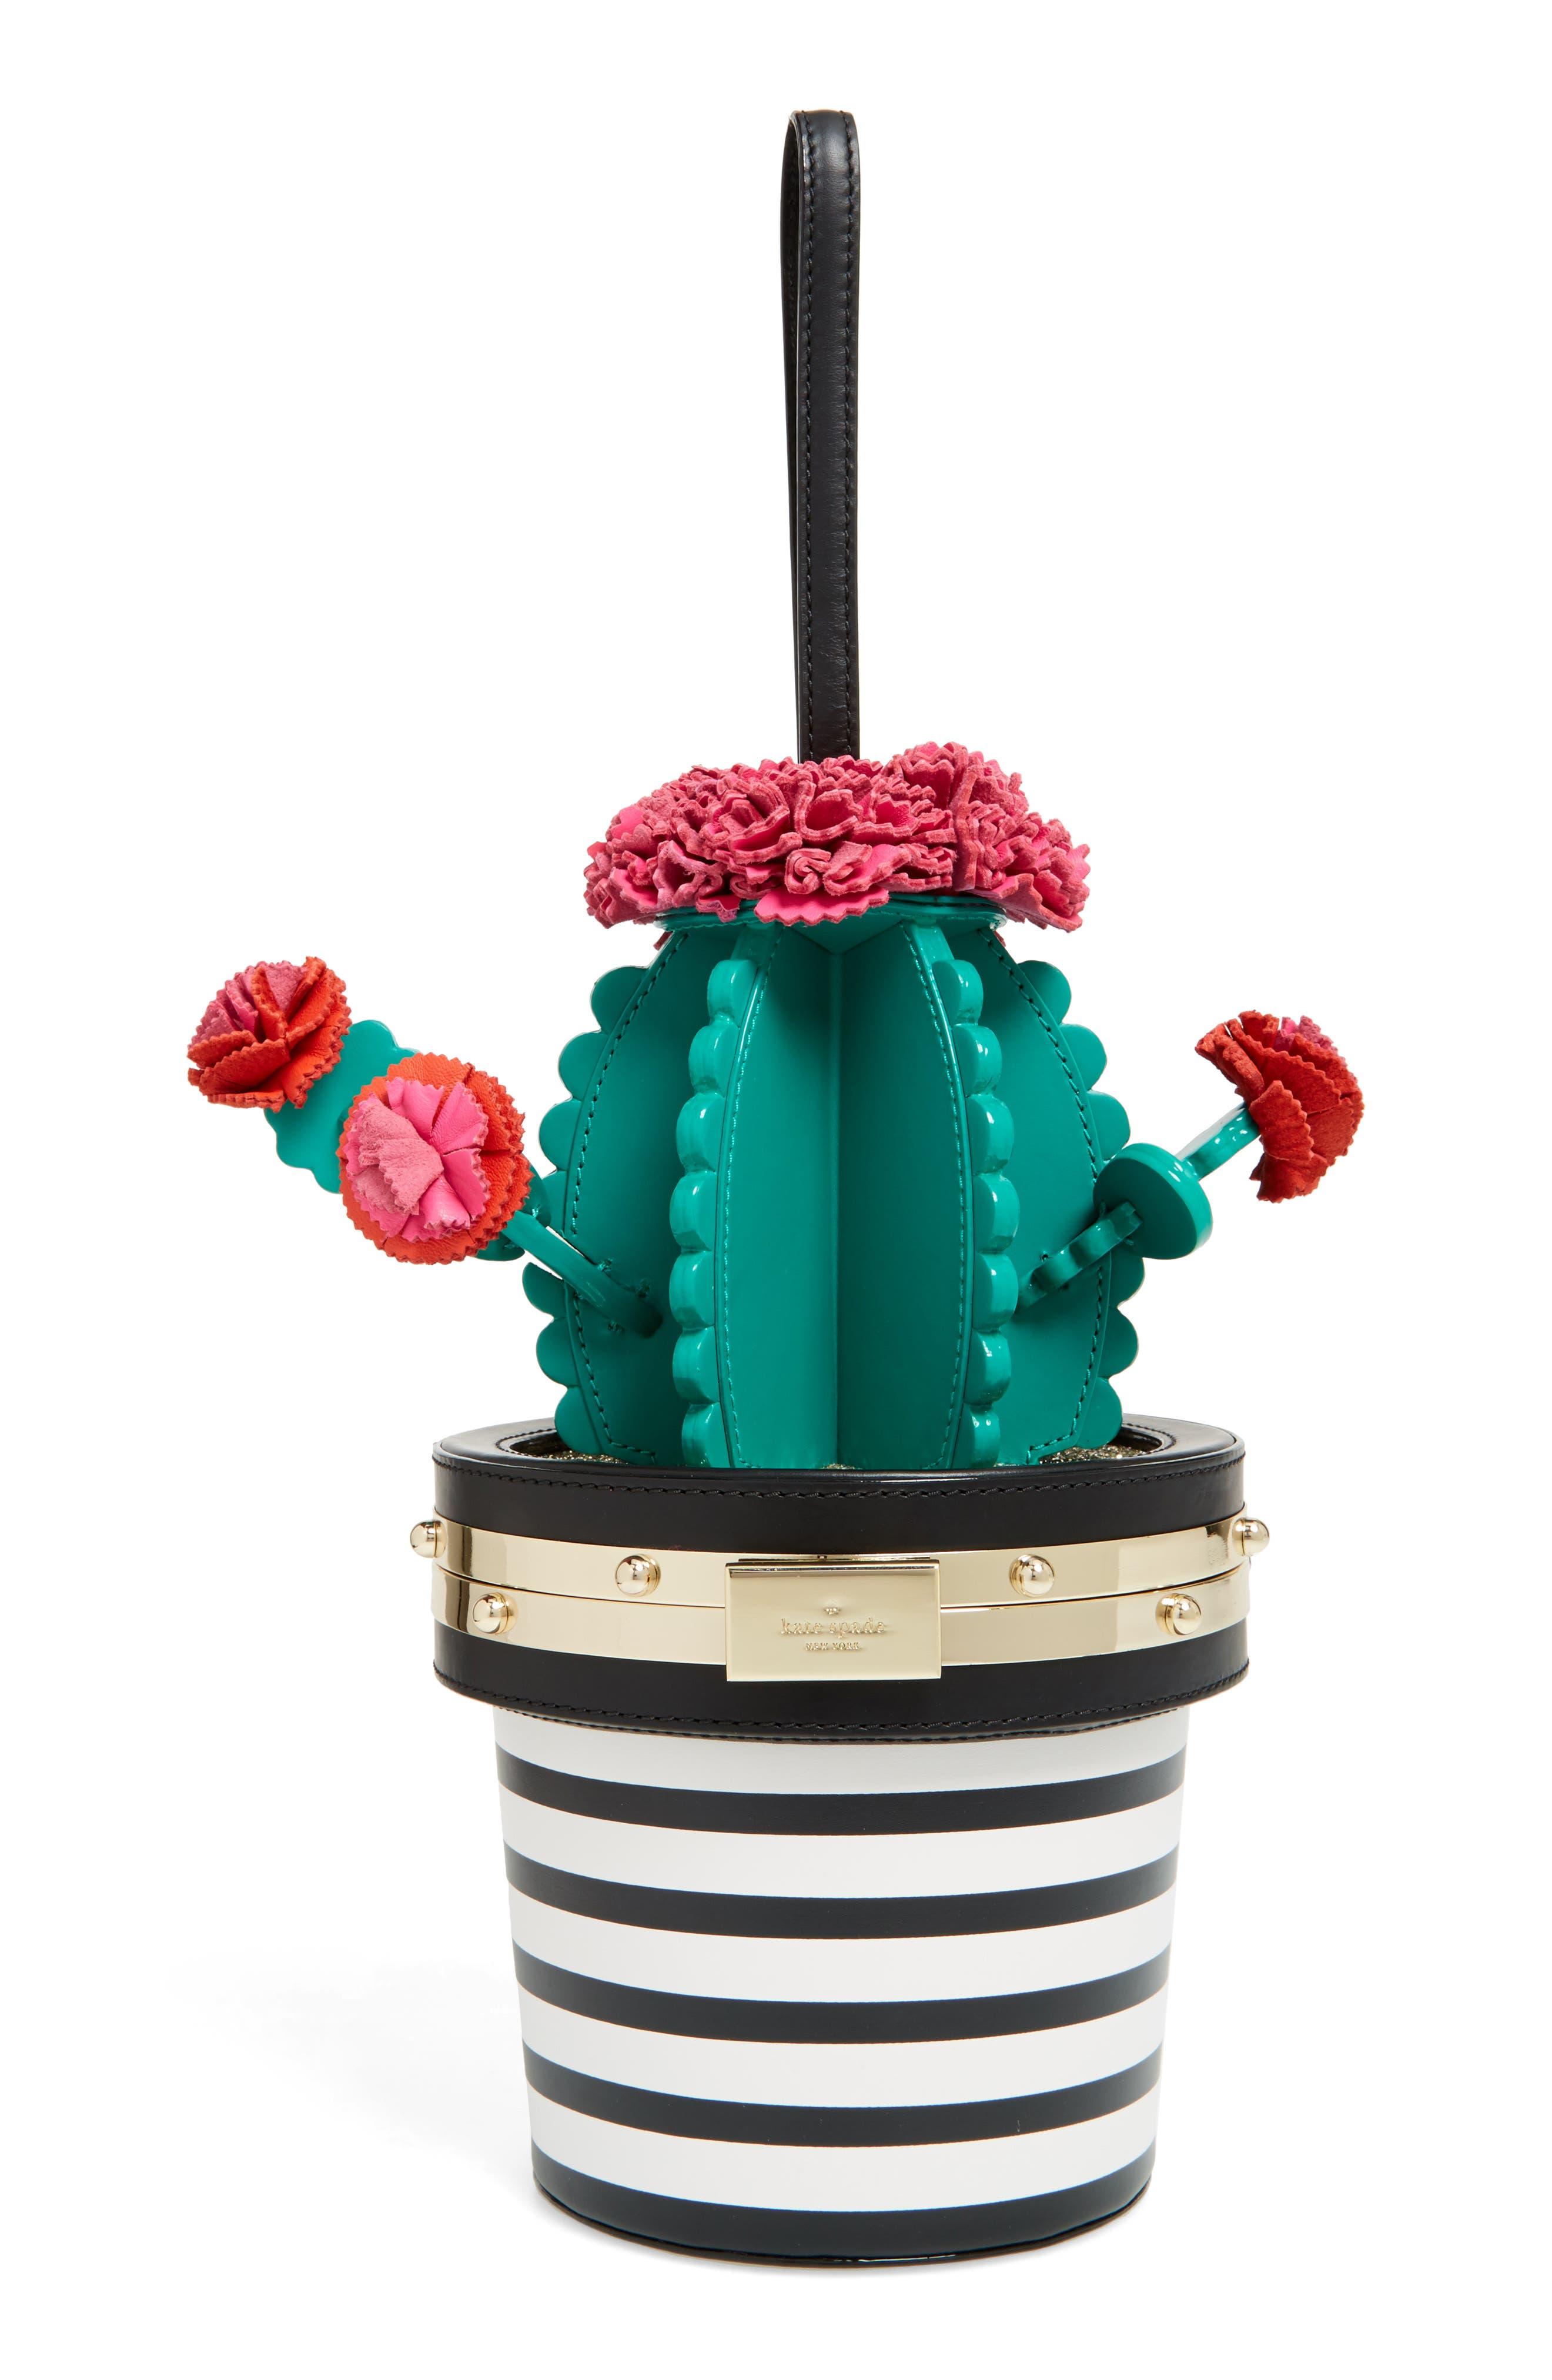 KATE SPADE NEW YORK scenic route cactus bag